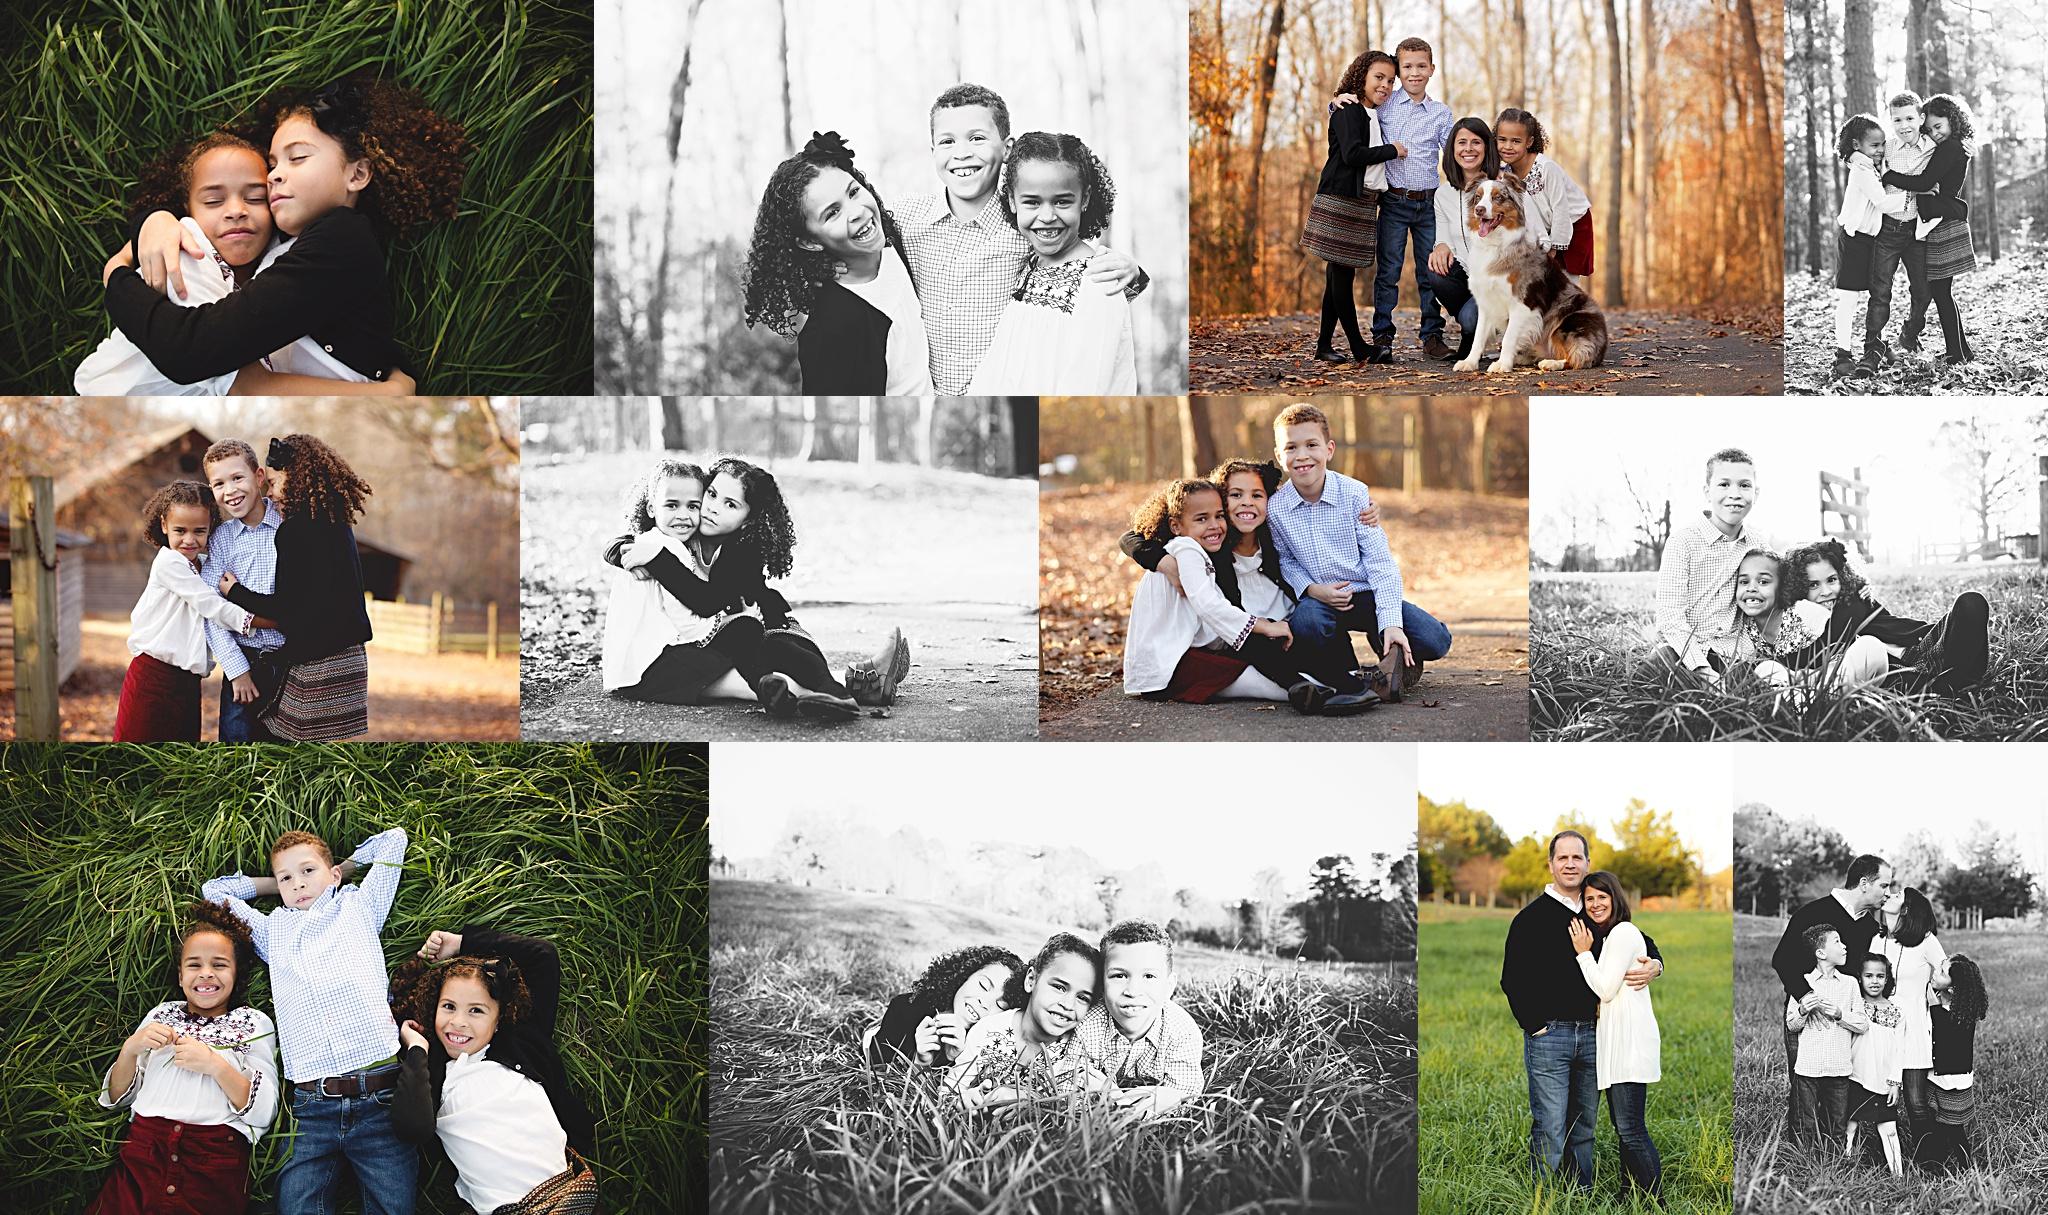 atlantafamilyphotographerphotography.jpg